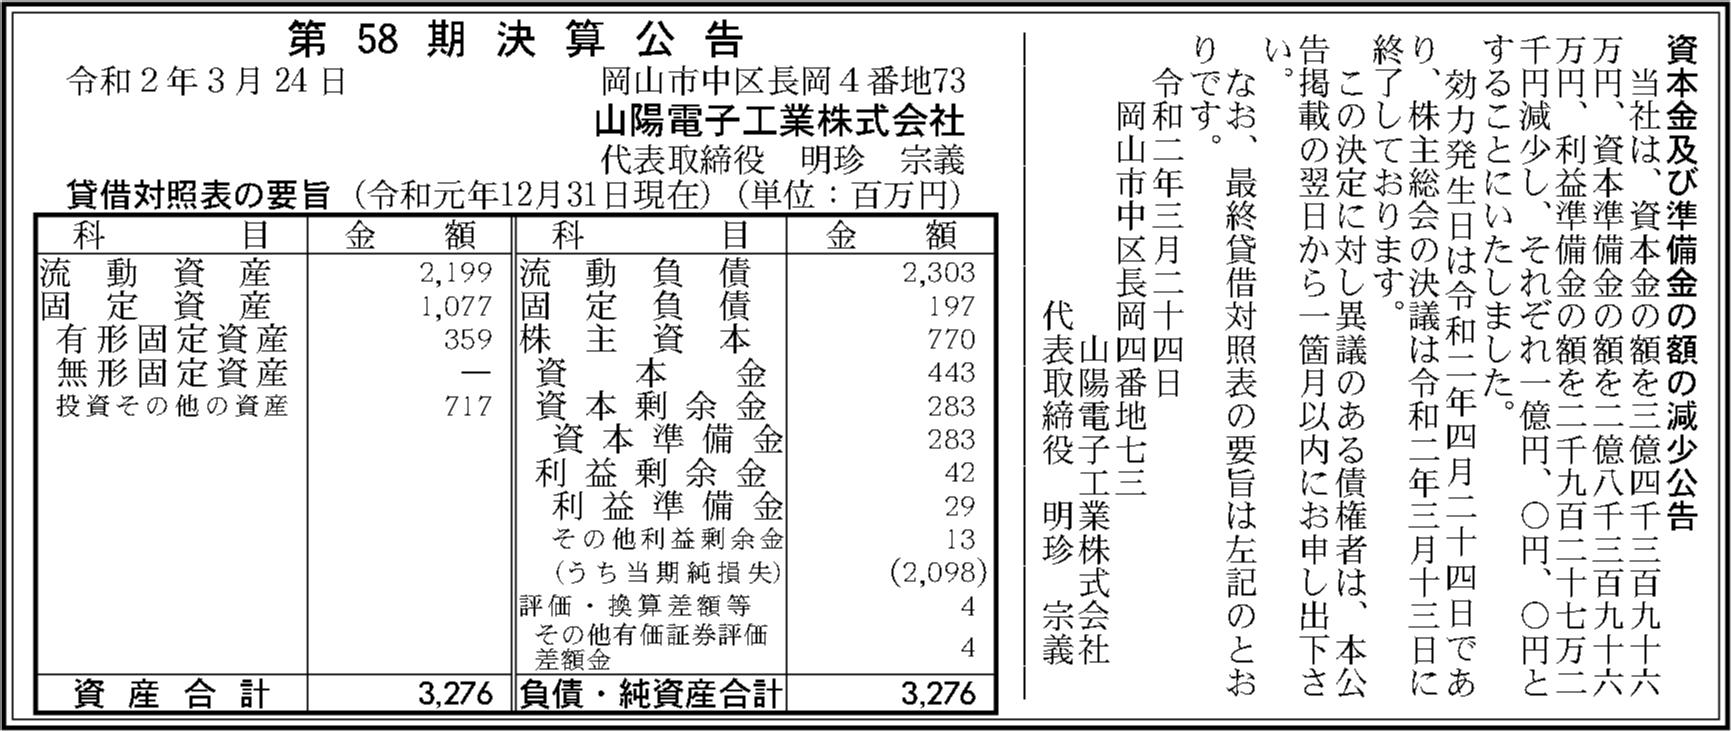 0060 fd3cffefaebda492059e7b1bddba6f0b48375b11cceba9abacb6d270ccfd7c20c121cbc2657042a0fa4c6e5021d6a4b0da6135bde91f99a507969897331faadd 06